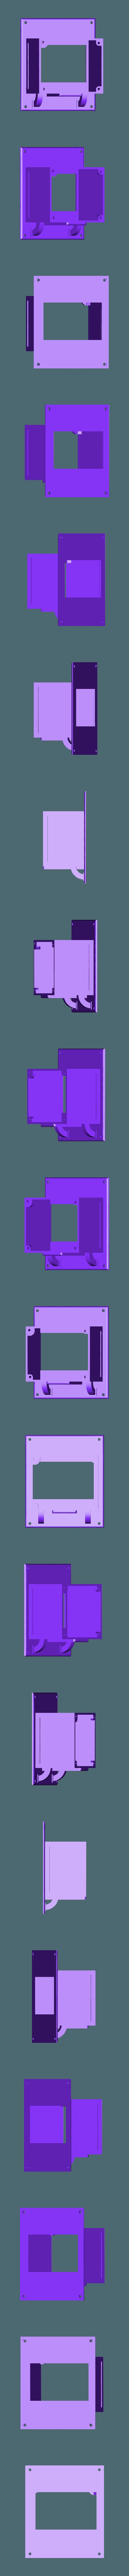 middle-level.stl Download free STL file Steampunk Oculus Roboticus • 3D print design, cyrusharding